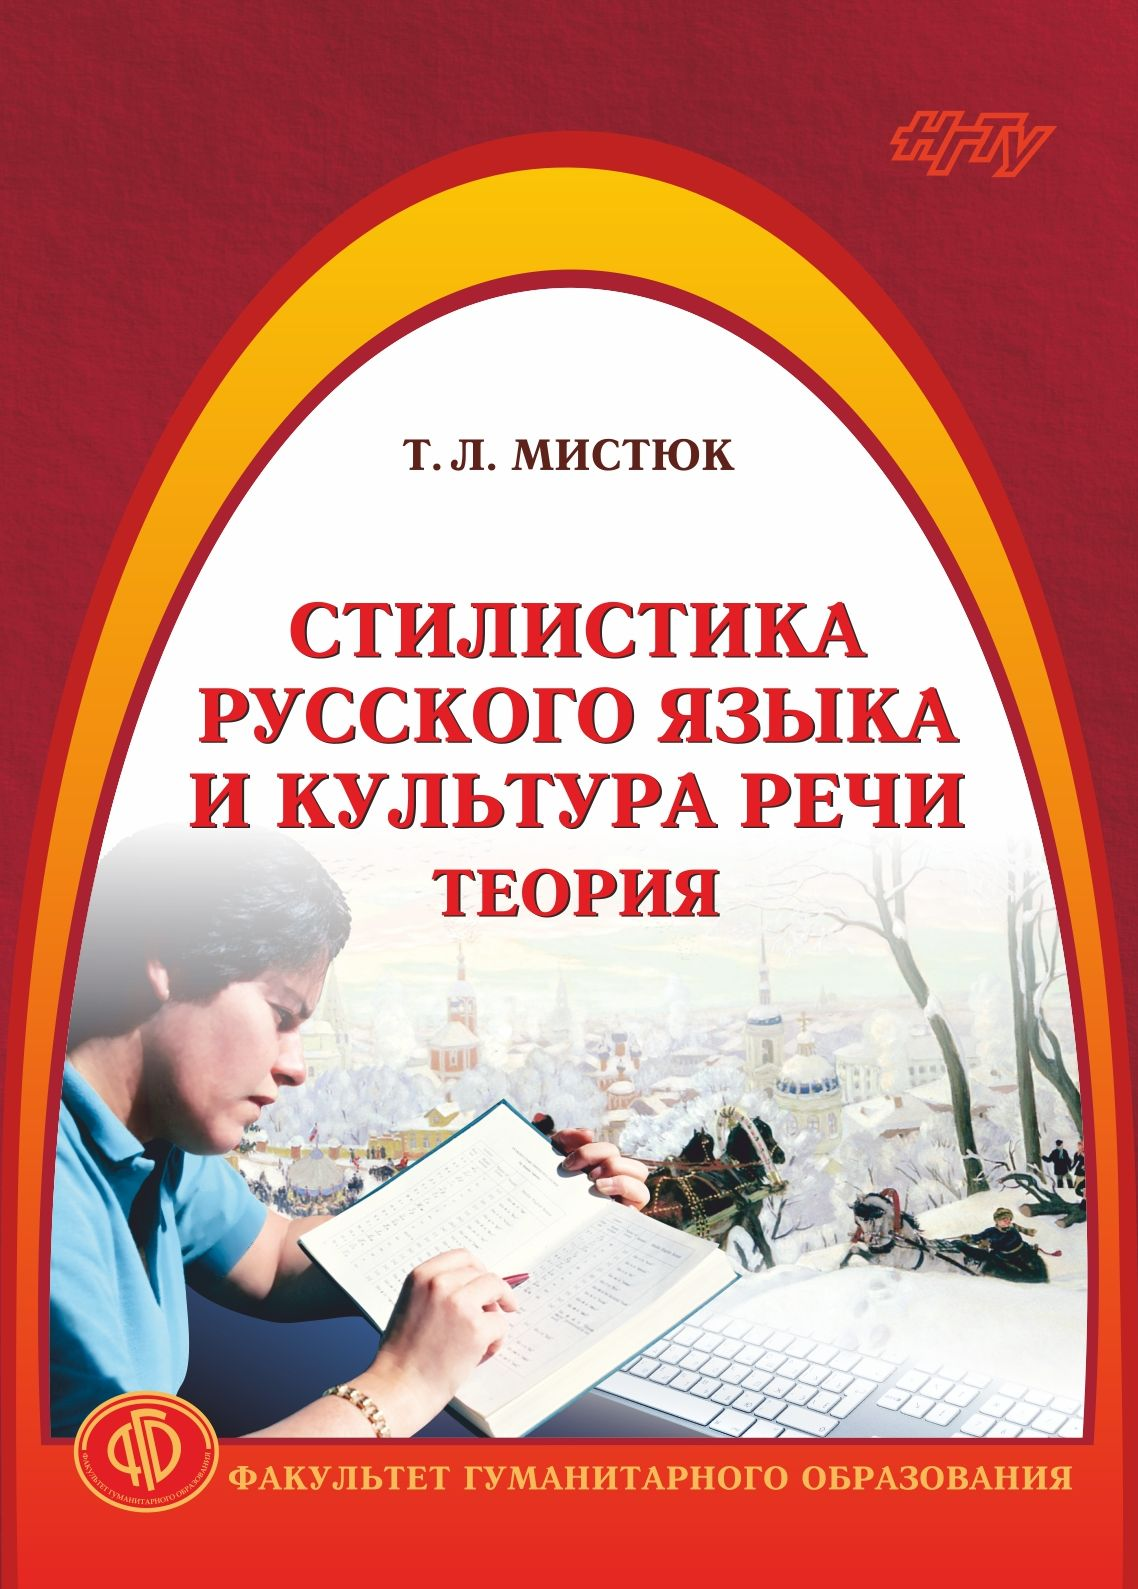 цена на Татьяна Мистюк Стилистика русского языка и культура речи. Теория